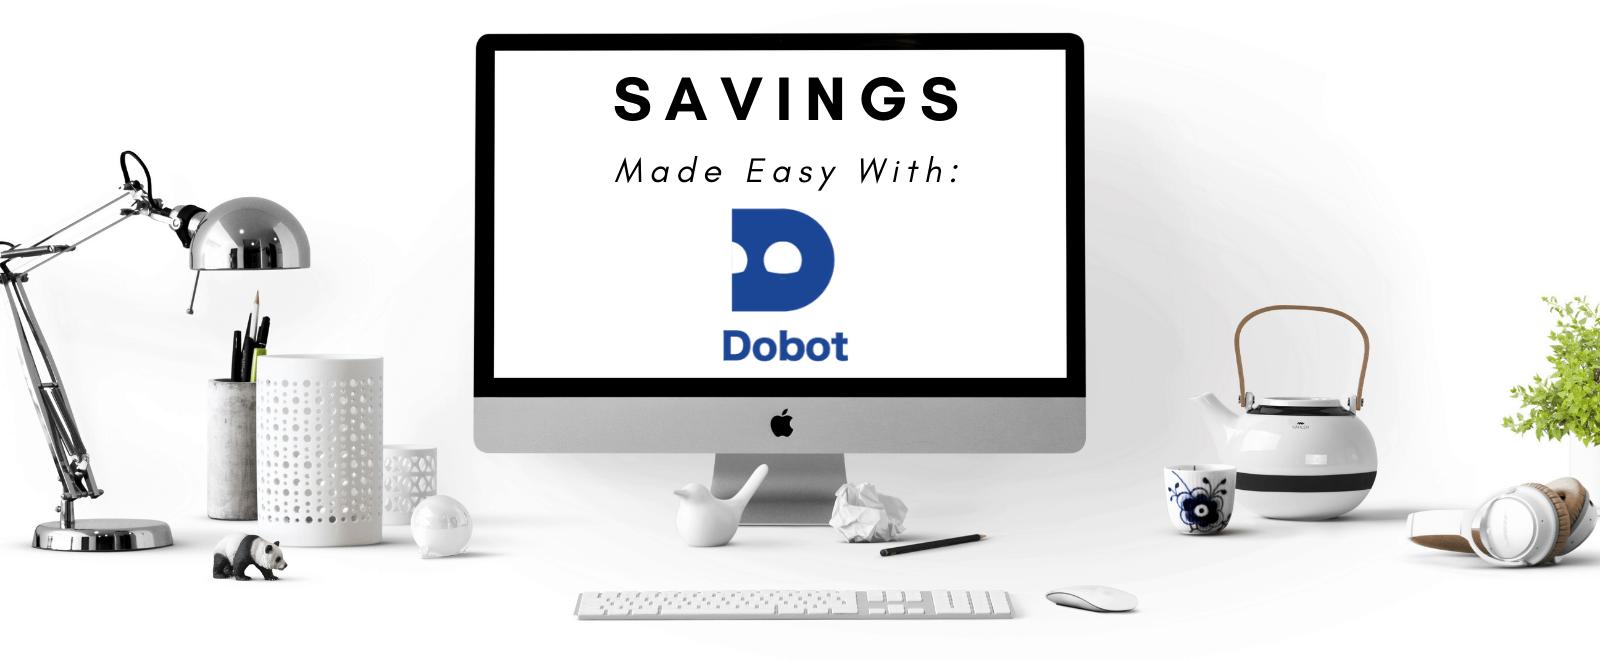 dobot saving money